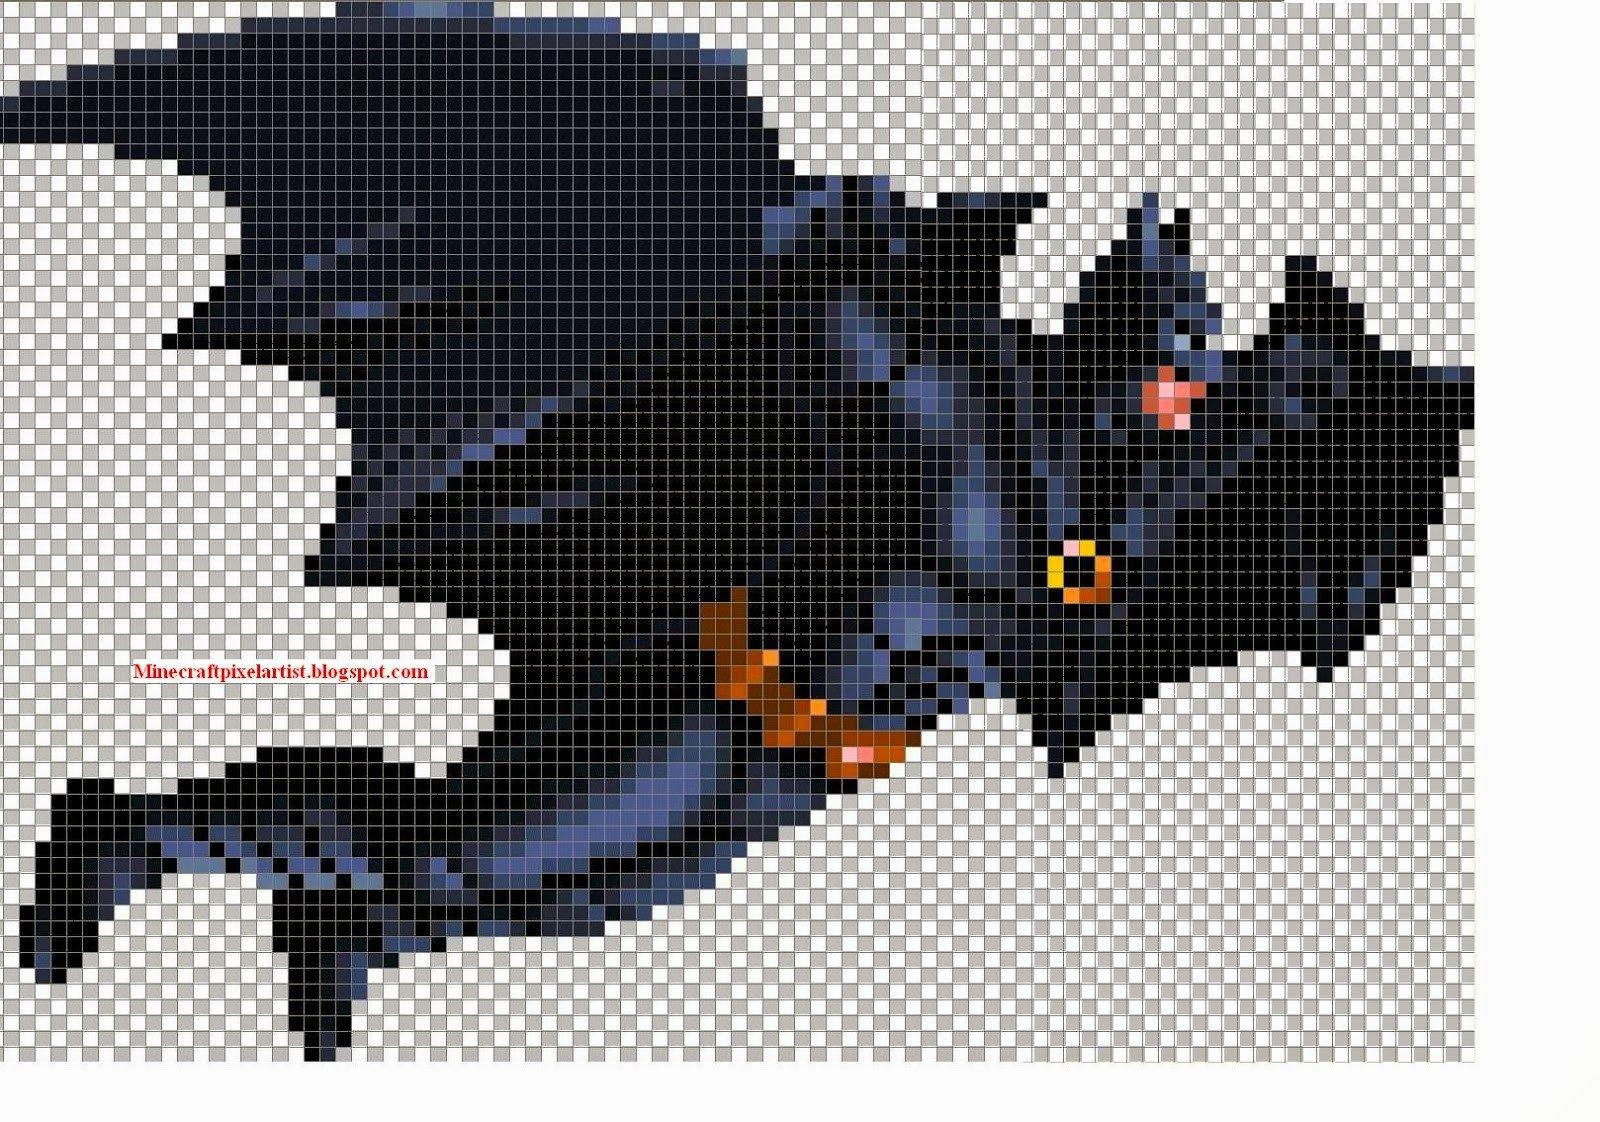 Minecraft Pixel Art Template Minecraft Pixel Art Templates and Tutorials